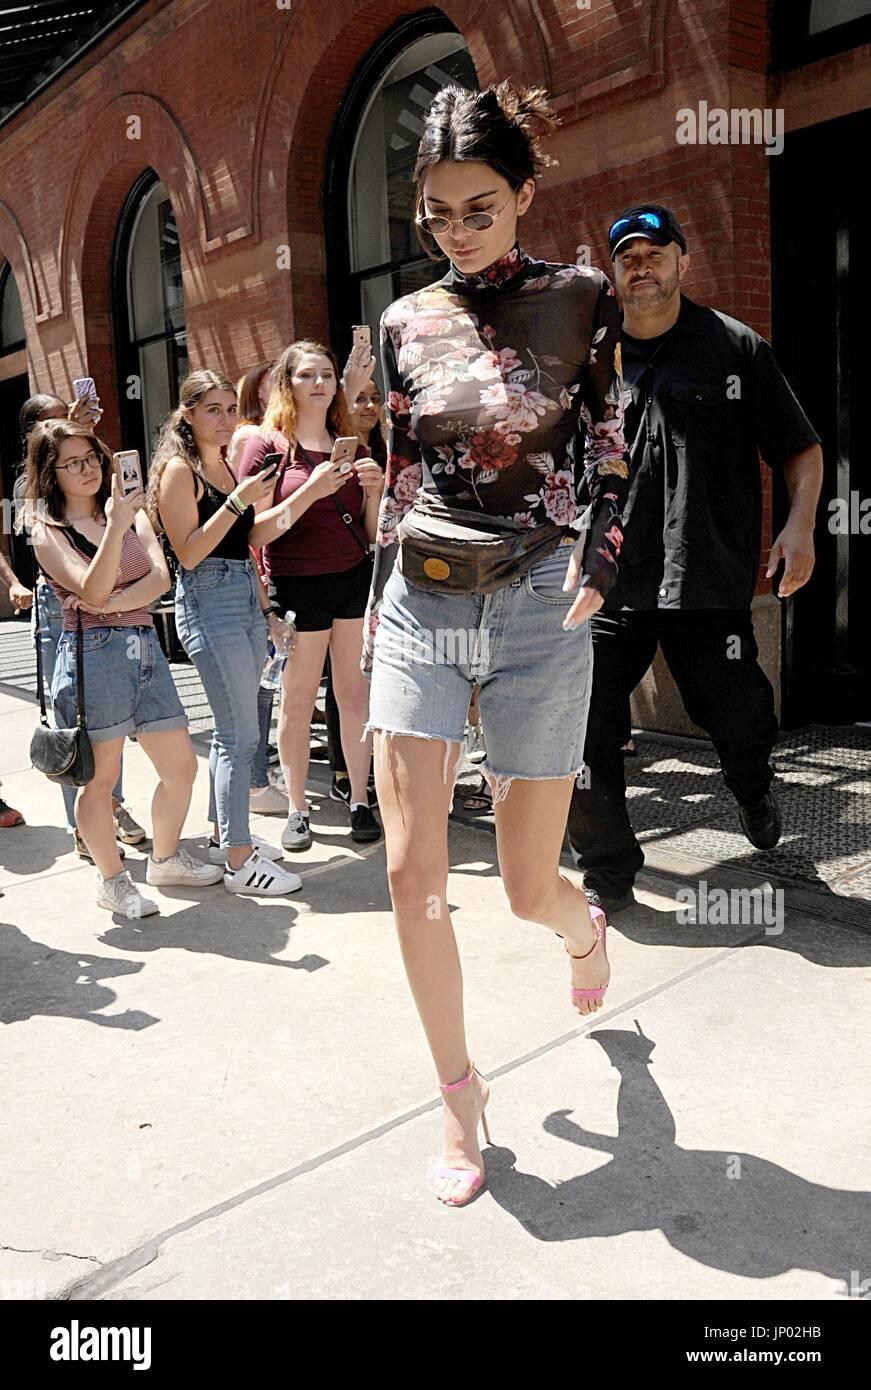 New York, NY, USA. 31. Juli 2017. Kendall Jenner unterwegs für Promi-Schnappschüsse - Mo, New York, NY Stockbild